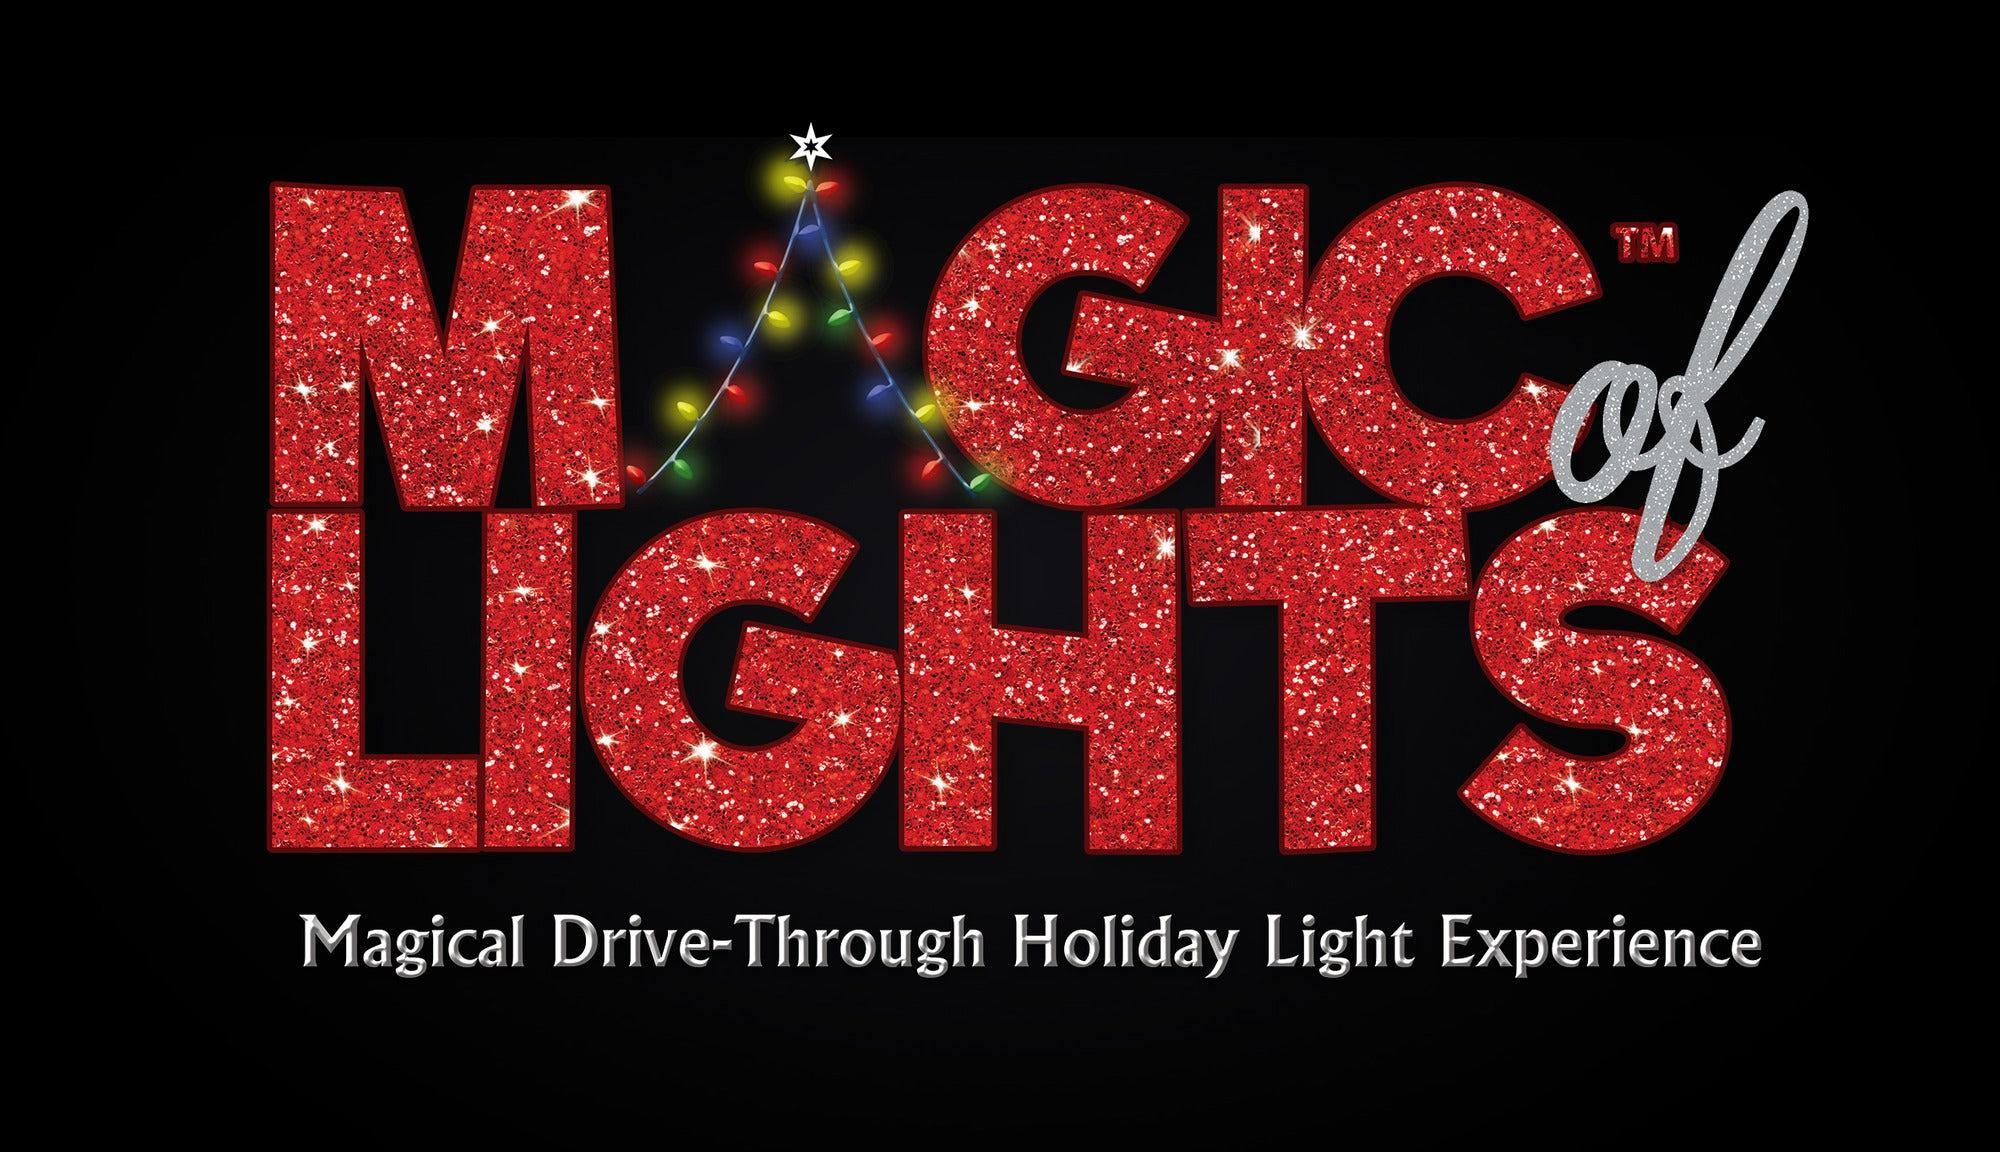 Magic Of Lights Drive Through Light Show Returns To Pnc Bank Arts Center